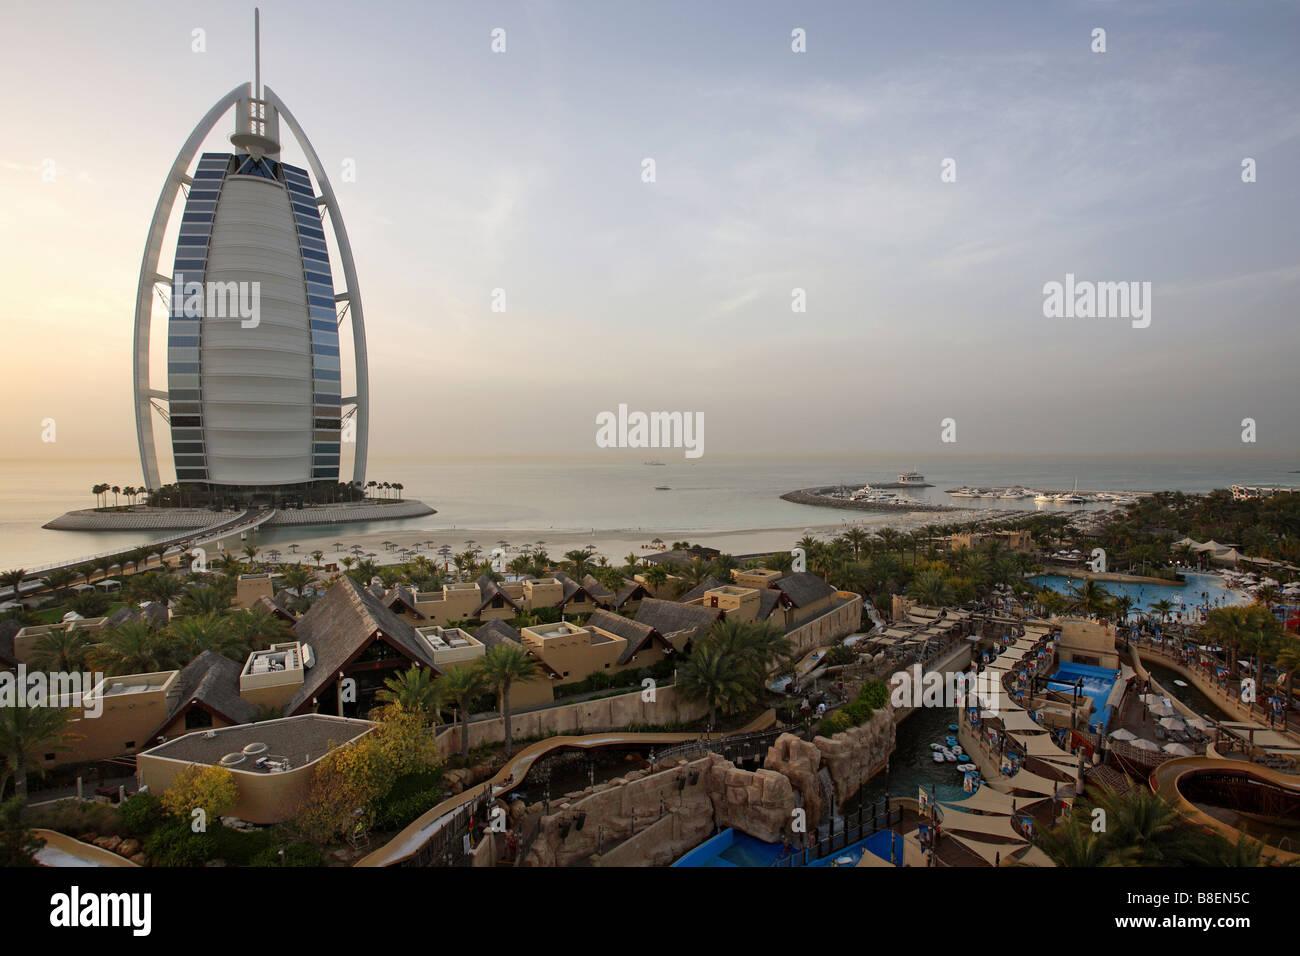 View Of Burj Al Arab Building And Wild Wadi Water Park In